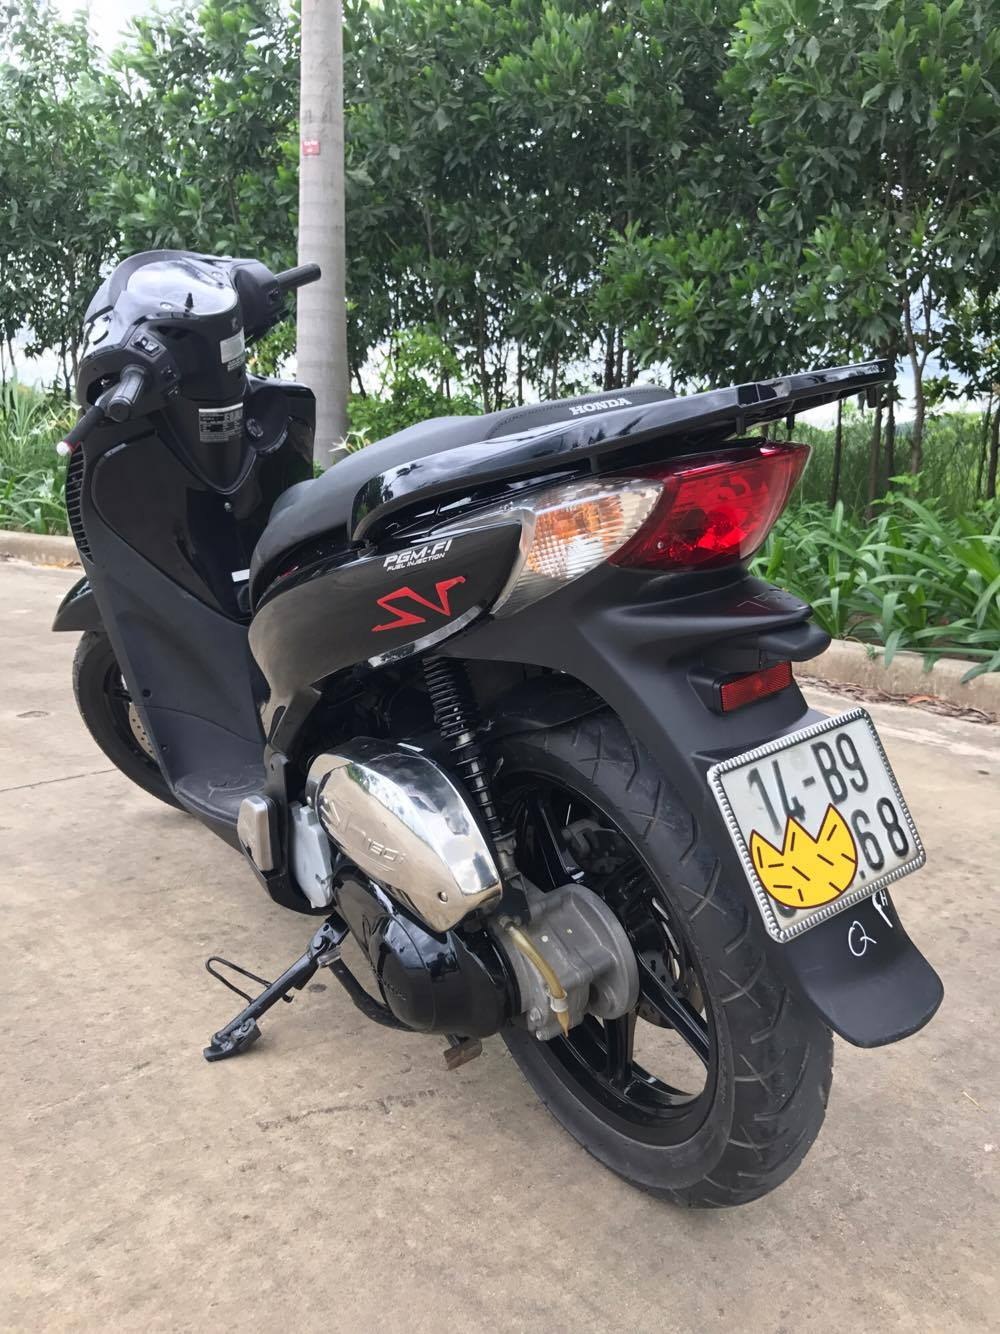 Ban xe shvn 150cc mau den chinh chu doi 2011 - 3